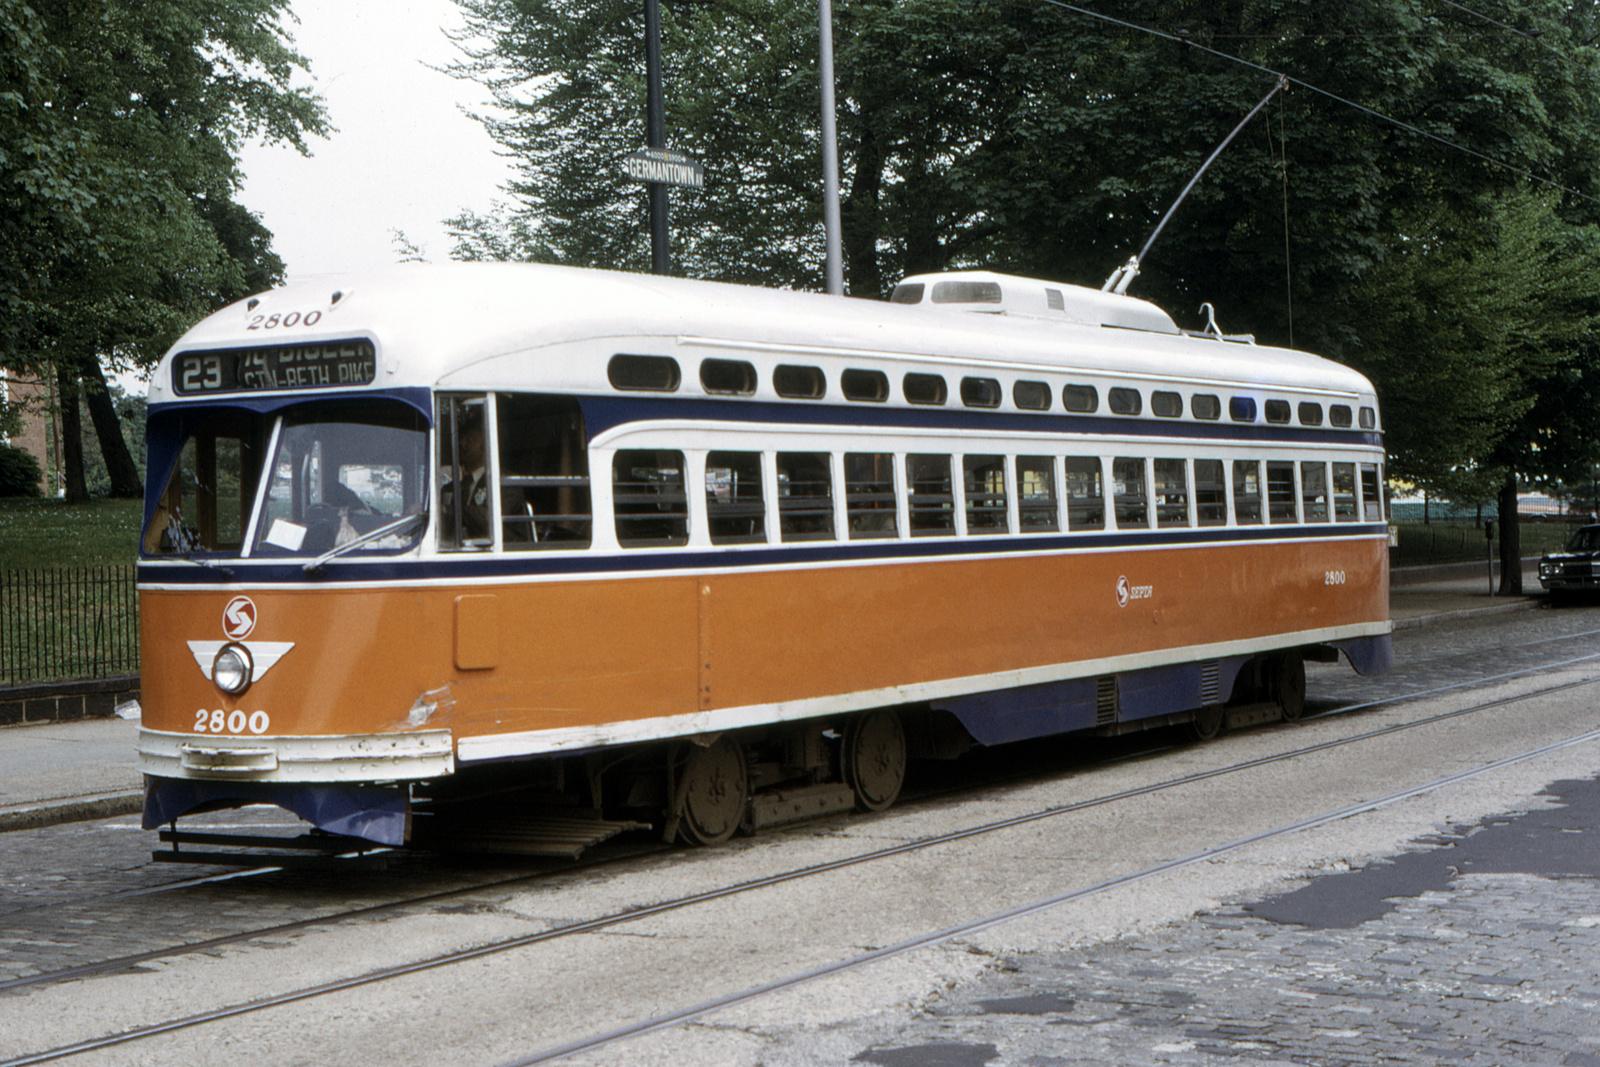 (897k, 1600x1067)<br><b>Country:</b> United States<br><b>City:</b> Philadelphia, PA<br><b>System:</b> SEPTA (or Predecessor)<br><b>Line:</b> Rt. 23-Germantown<br><b>Location:</b> Germantown/Harvey<br><b>Car:</b> PTC/SEPTA Postwar All-electric PCC (St.Louis, 1947) 2800 <br><b>Collection of:</b> David Pirmann<br><b>Date:</b> 5/11/1974<br><b>Viewed (this week/total):</b> 1 / 95